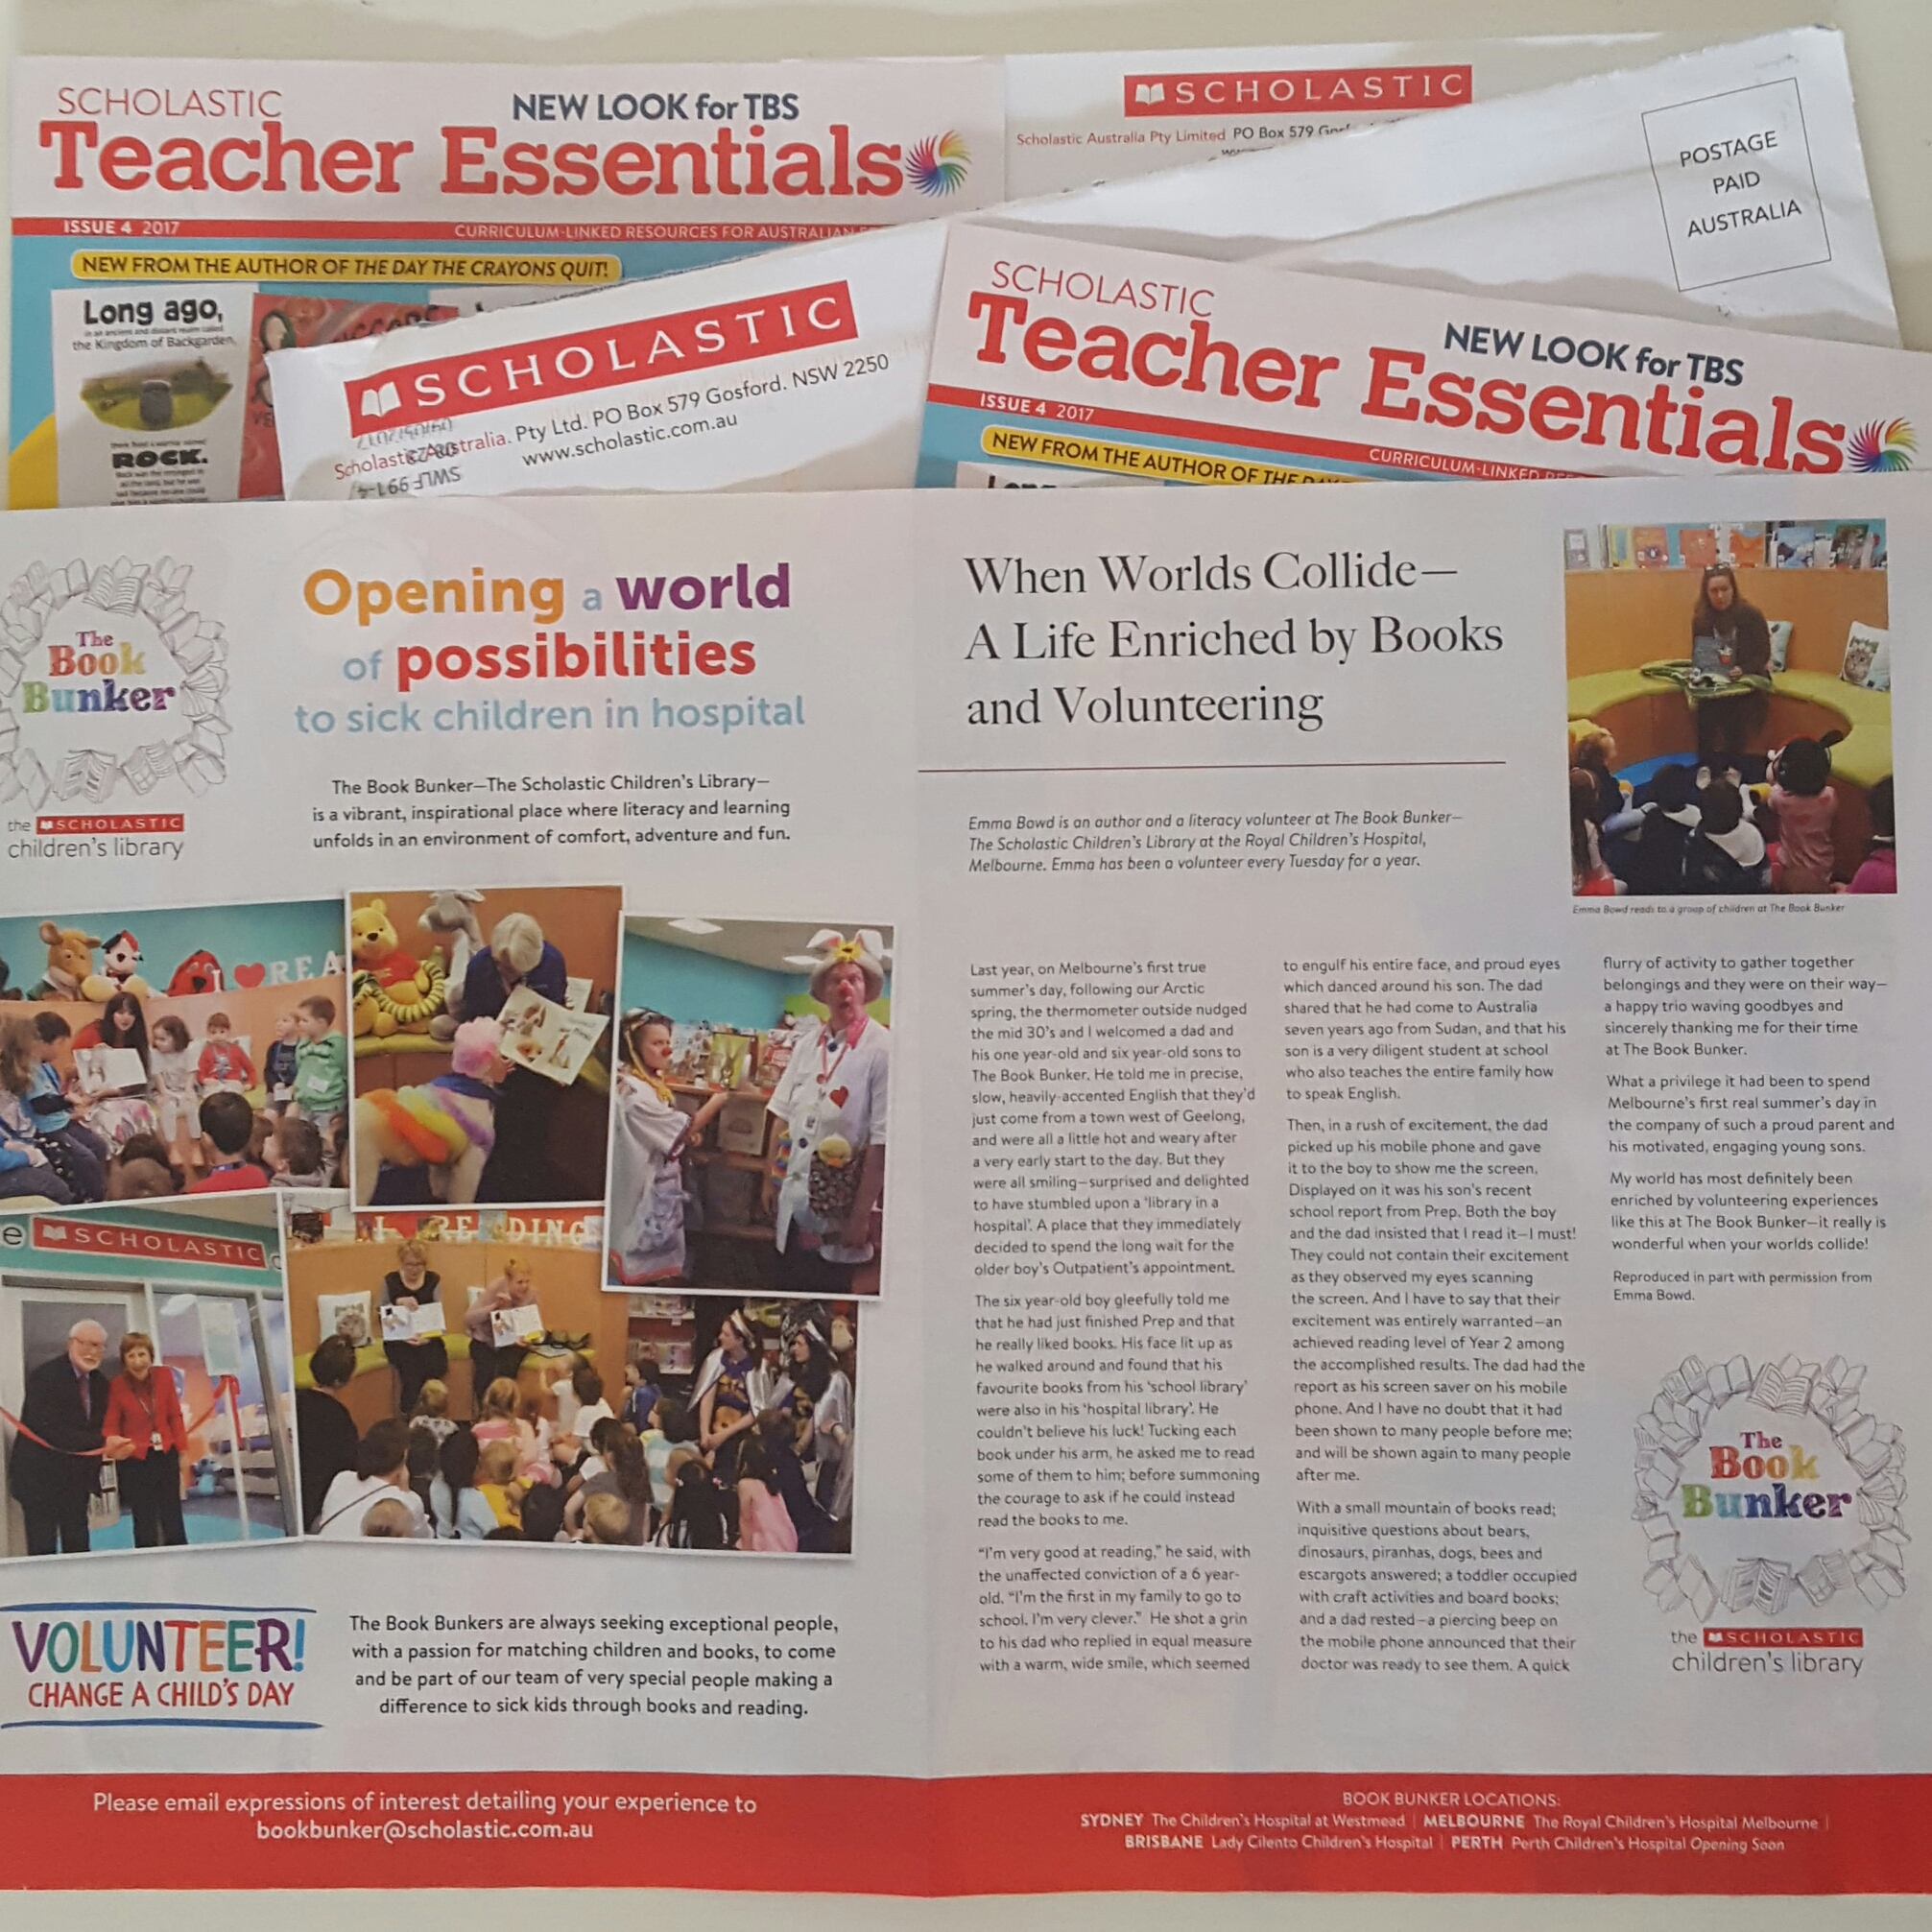 Scholastic Teacher Essentials Magazine - Issue 4, May 2017 - Emma Bowd